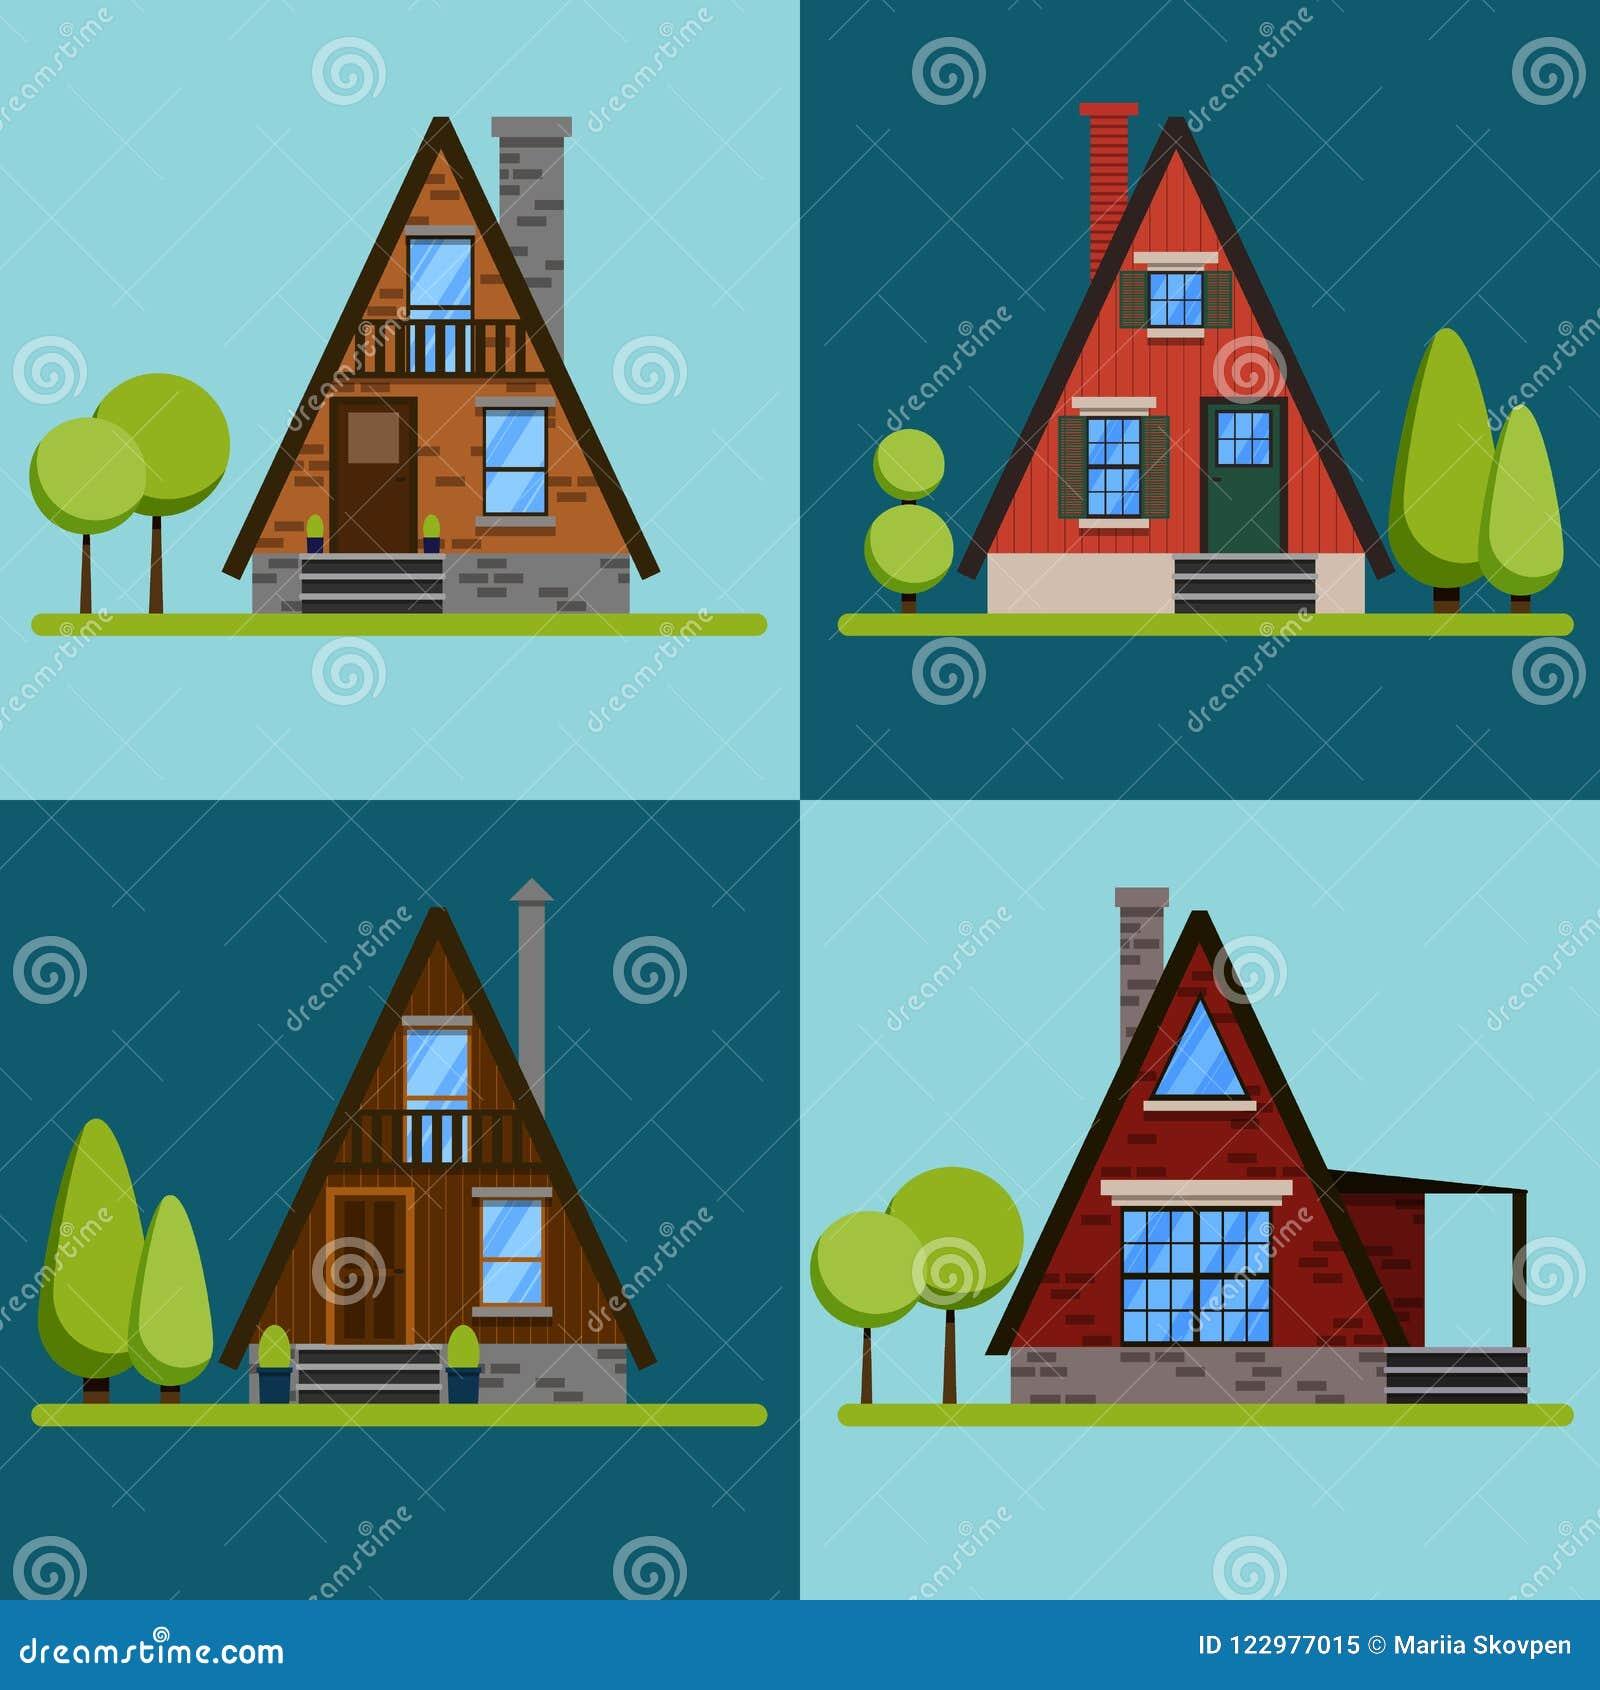 Set Of House Icons Or Symbols Triangular Brick And Wood